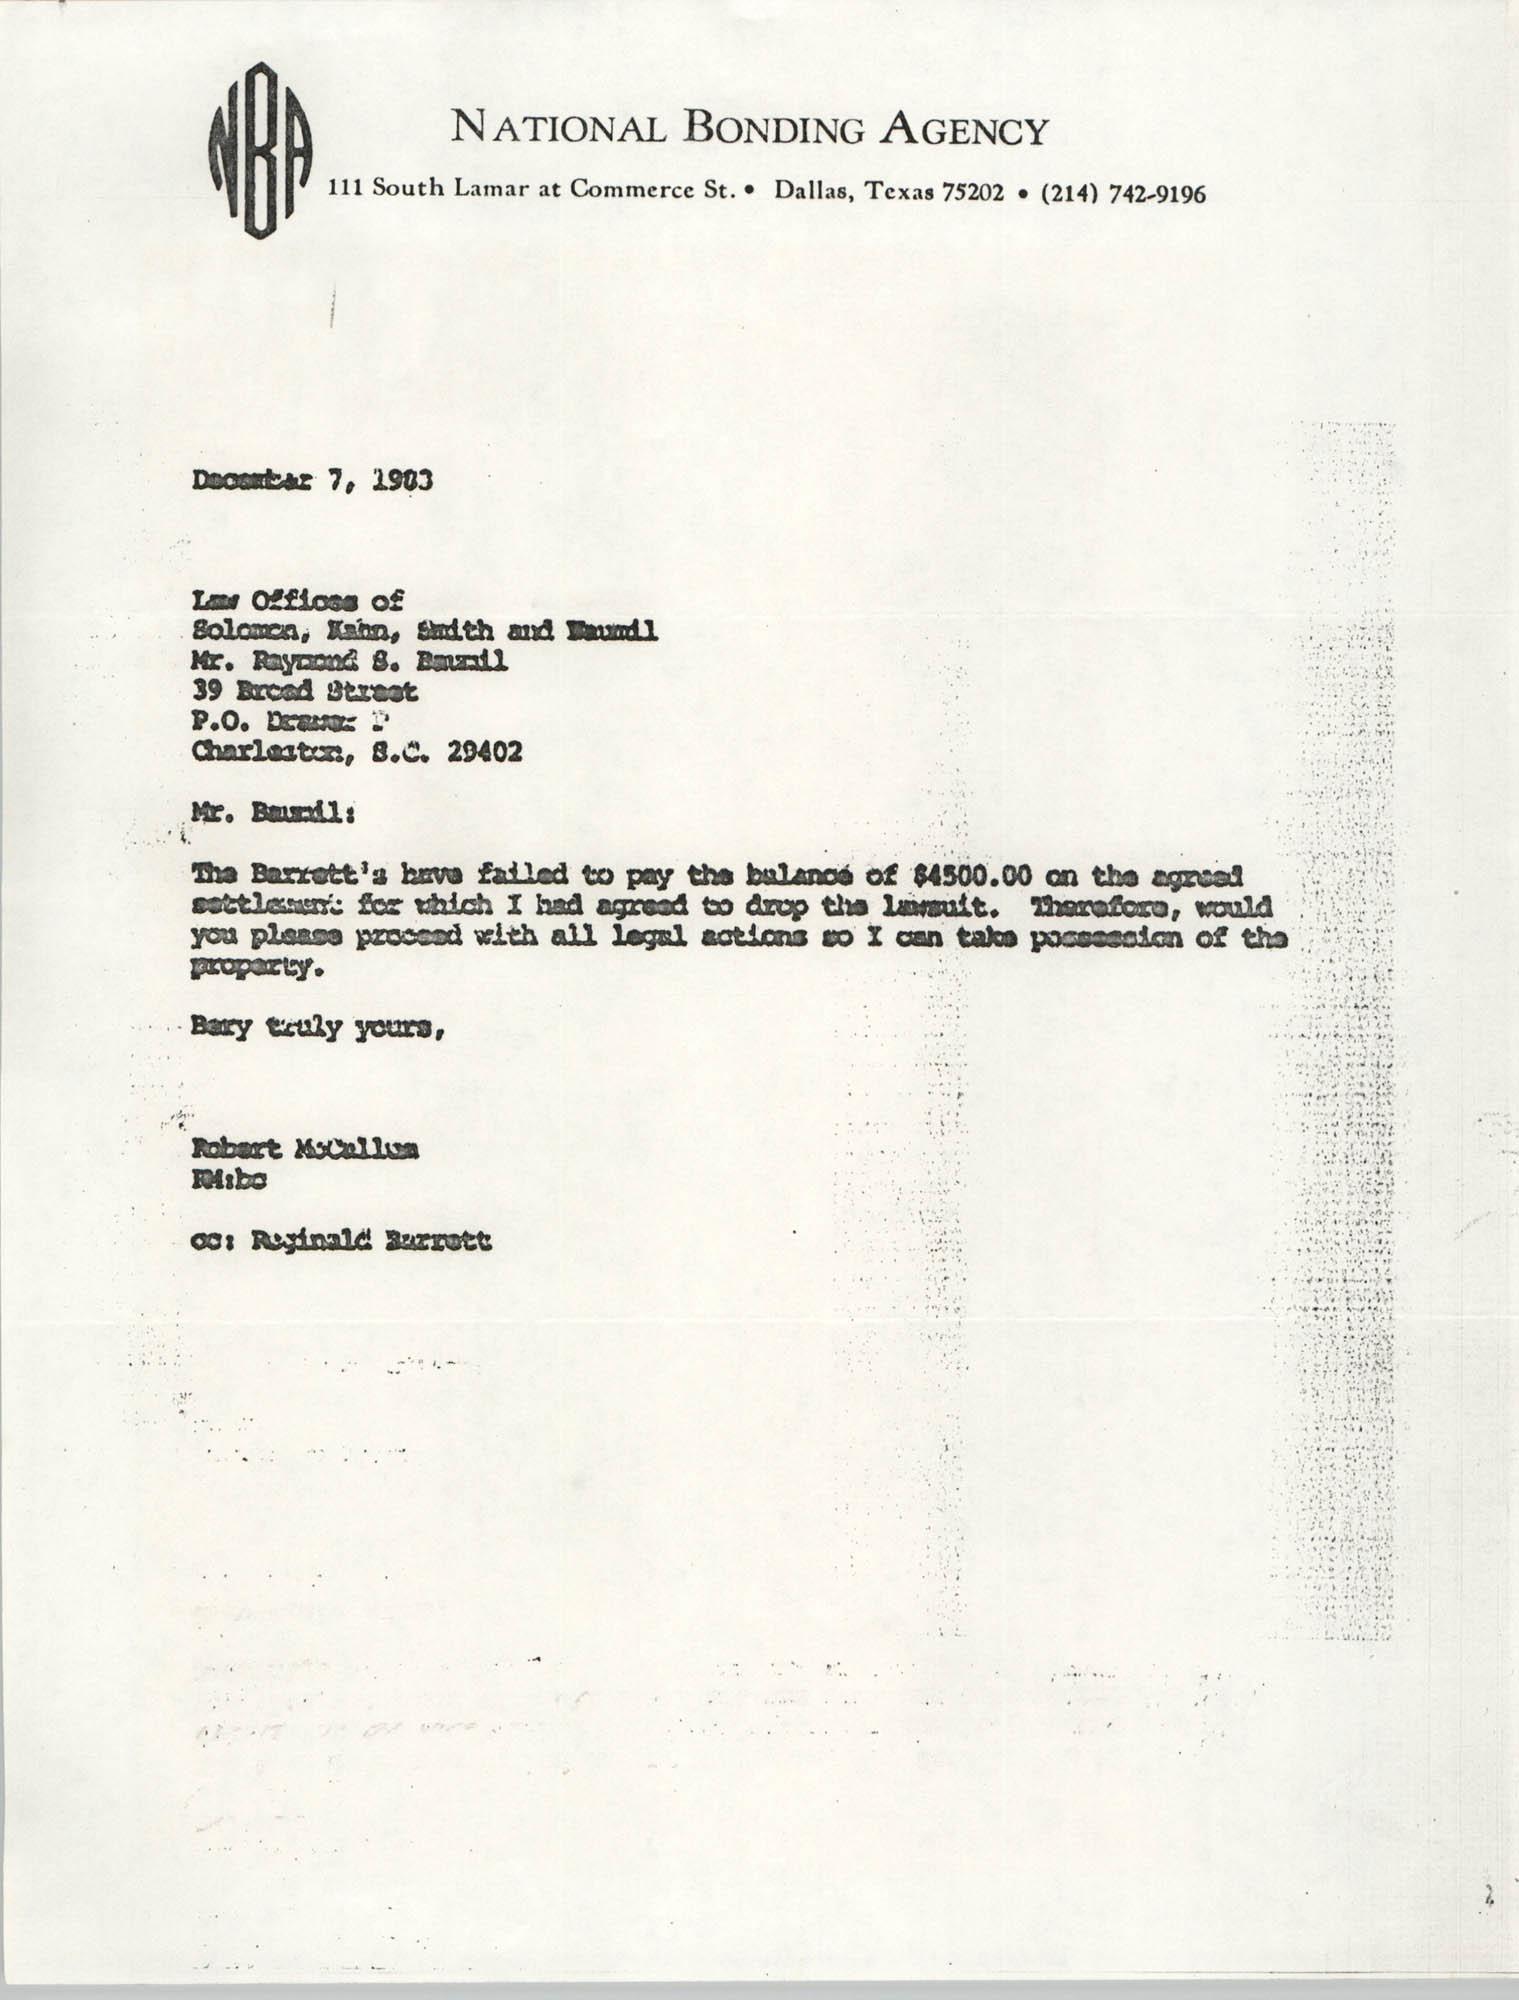 Letter from Robert McCallum to Raymond S. Baumil, December7, 1983